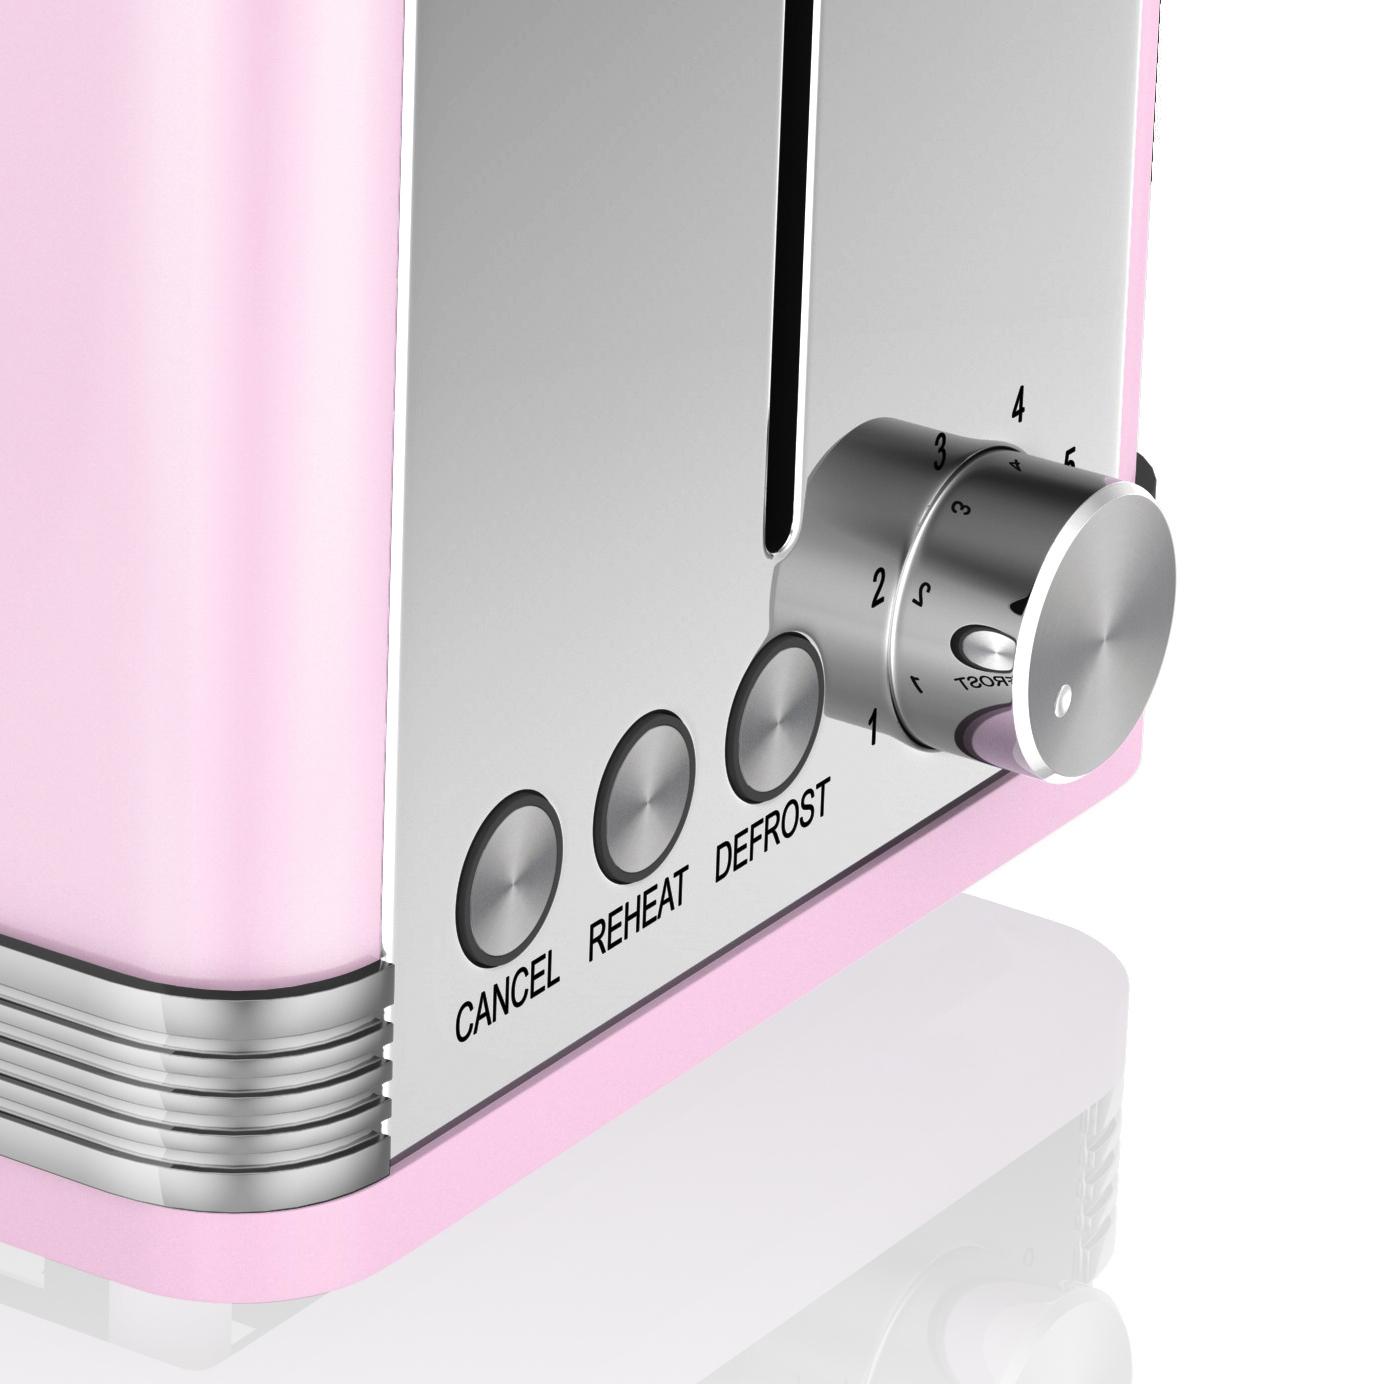 thumbnail 79 - Swan Retro 1.5L Jug Kettle 3KW, 2 Slice Toaster 815W & 20L Digital Microwave Set